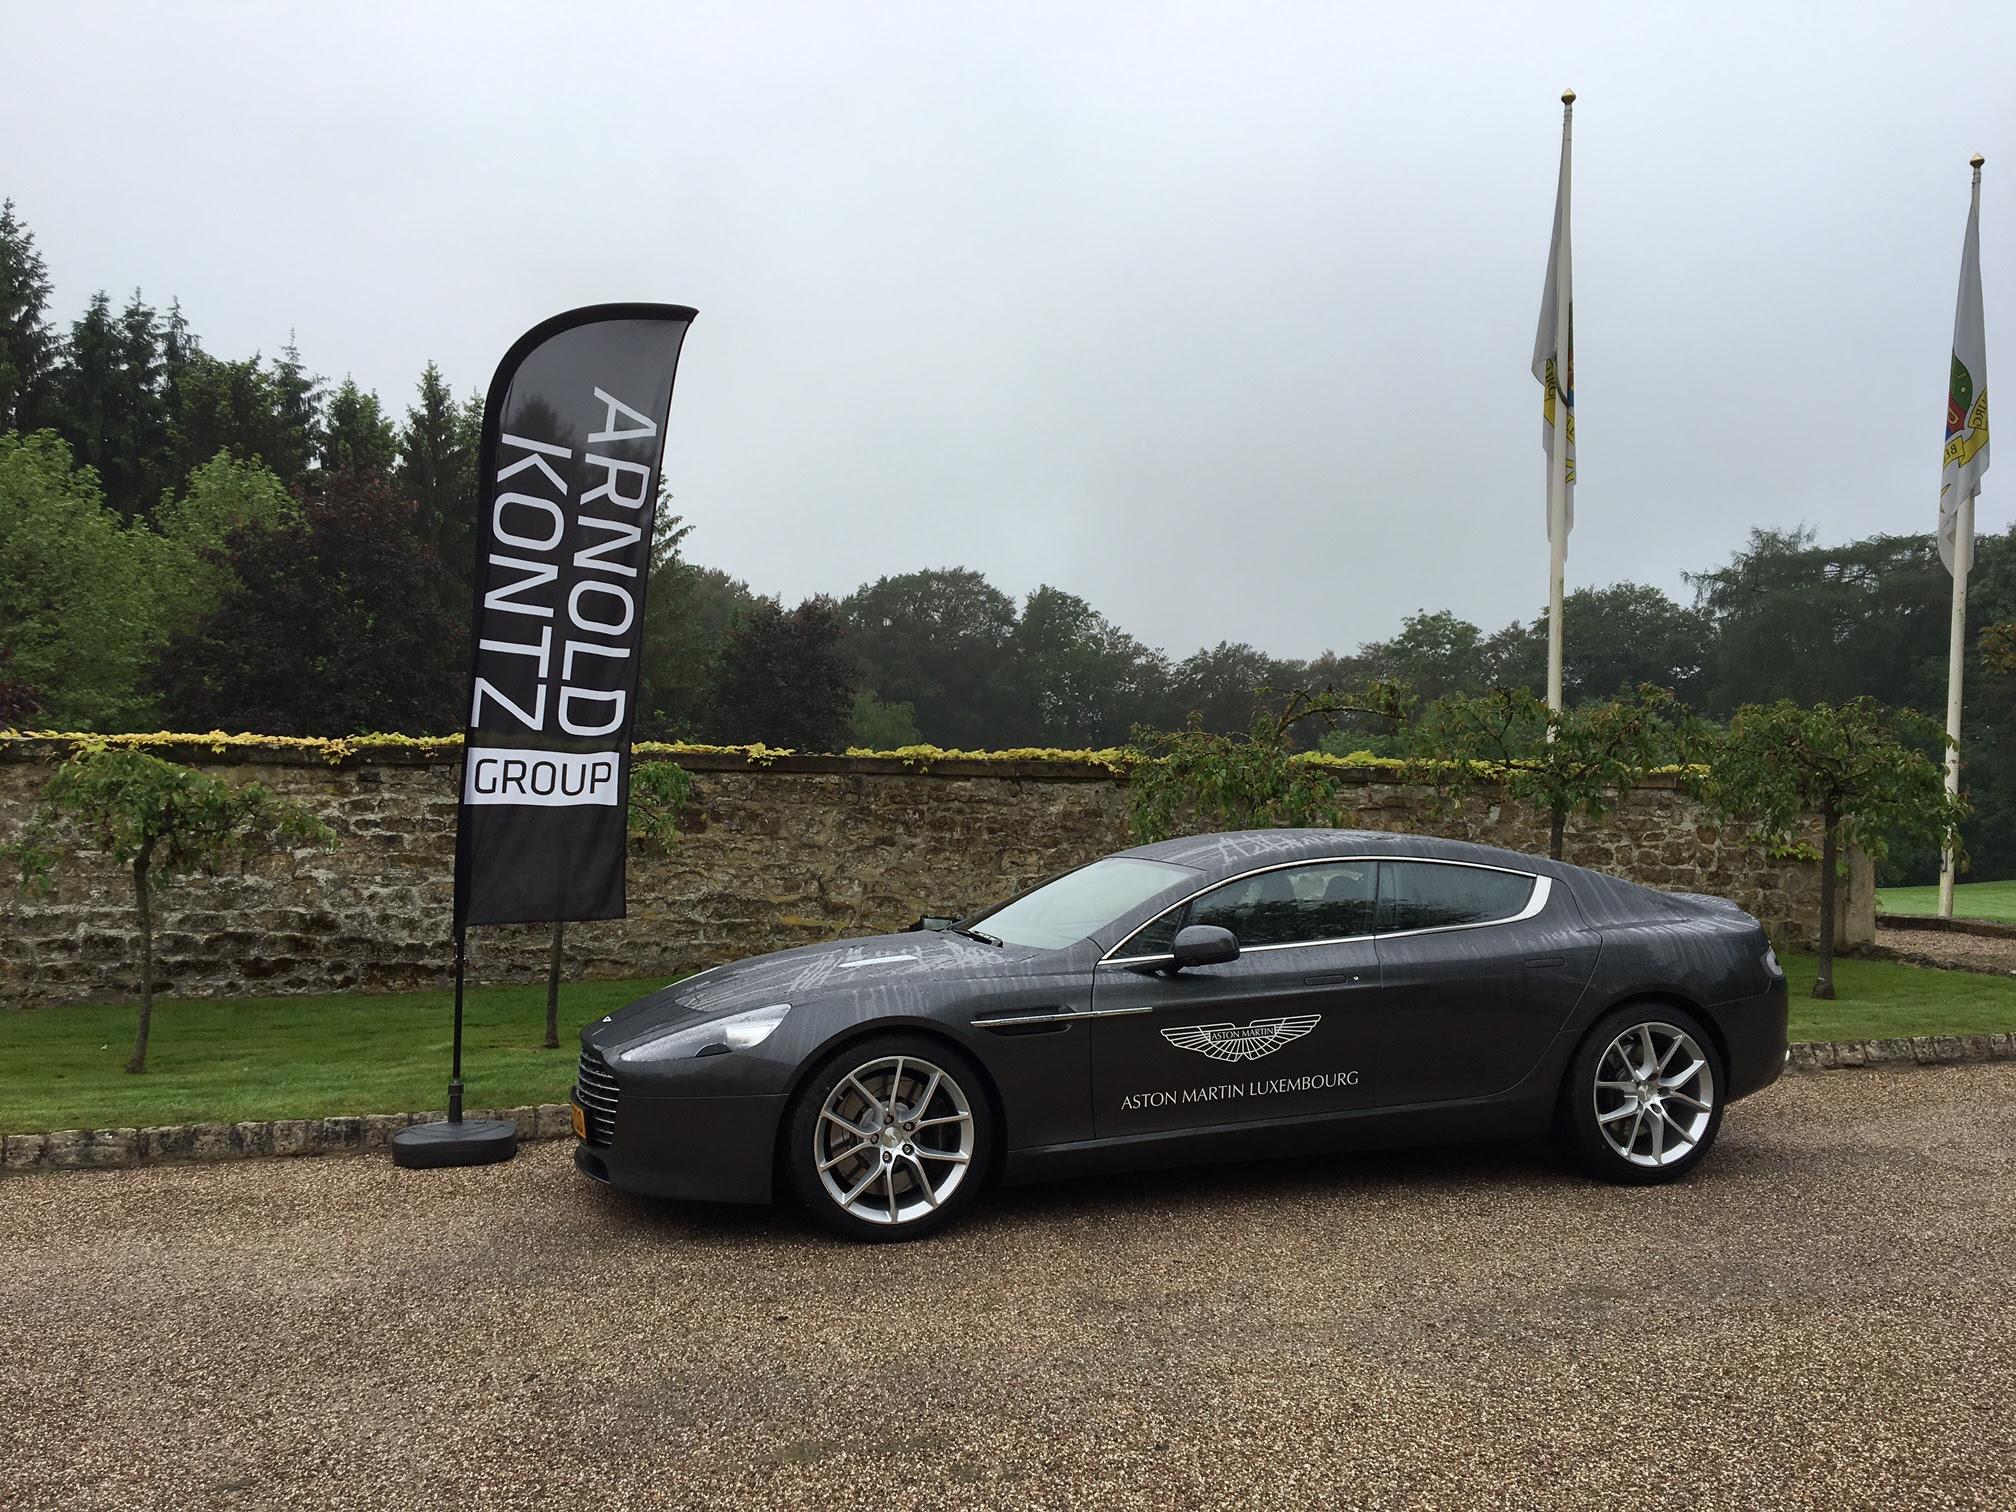 Events Aston Martin Luxembourg Official Aston Martin Dealer